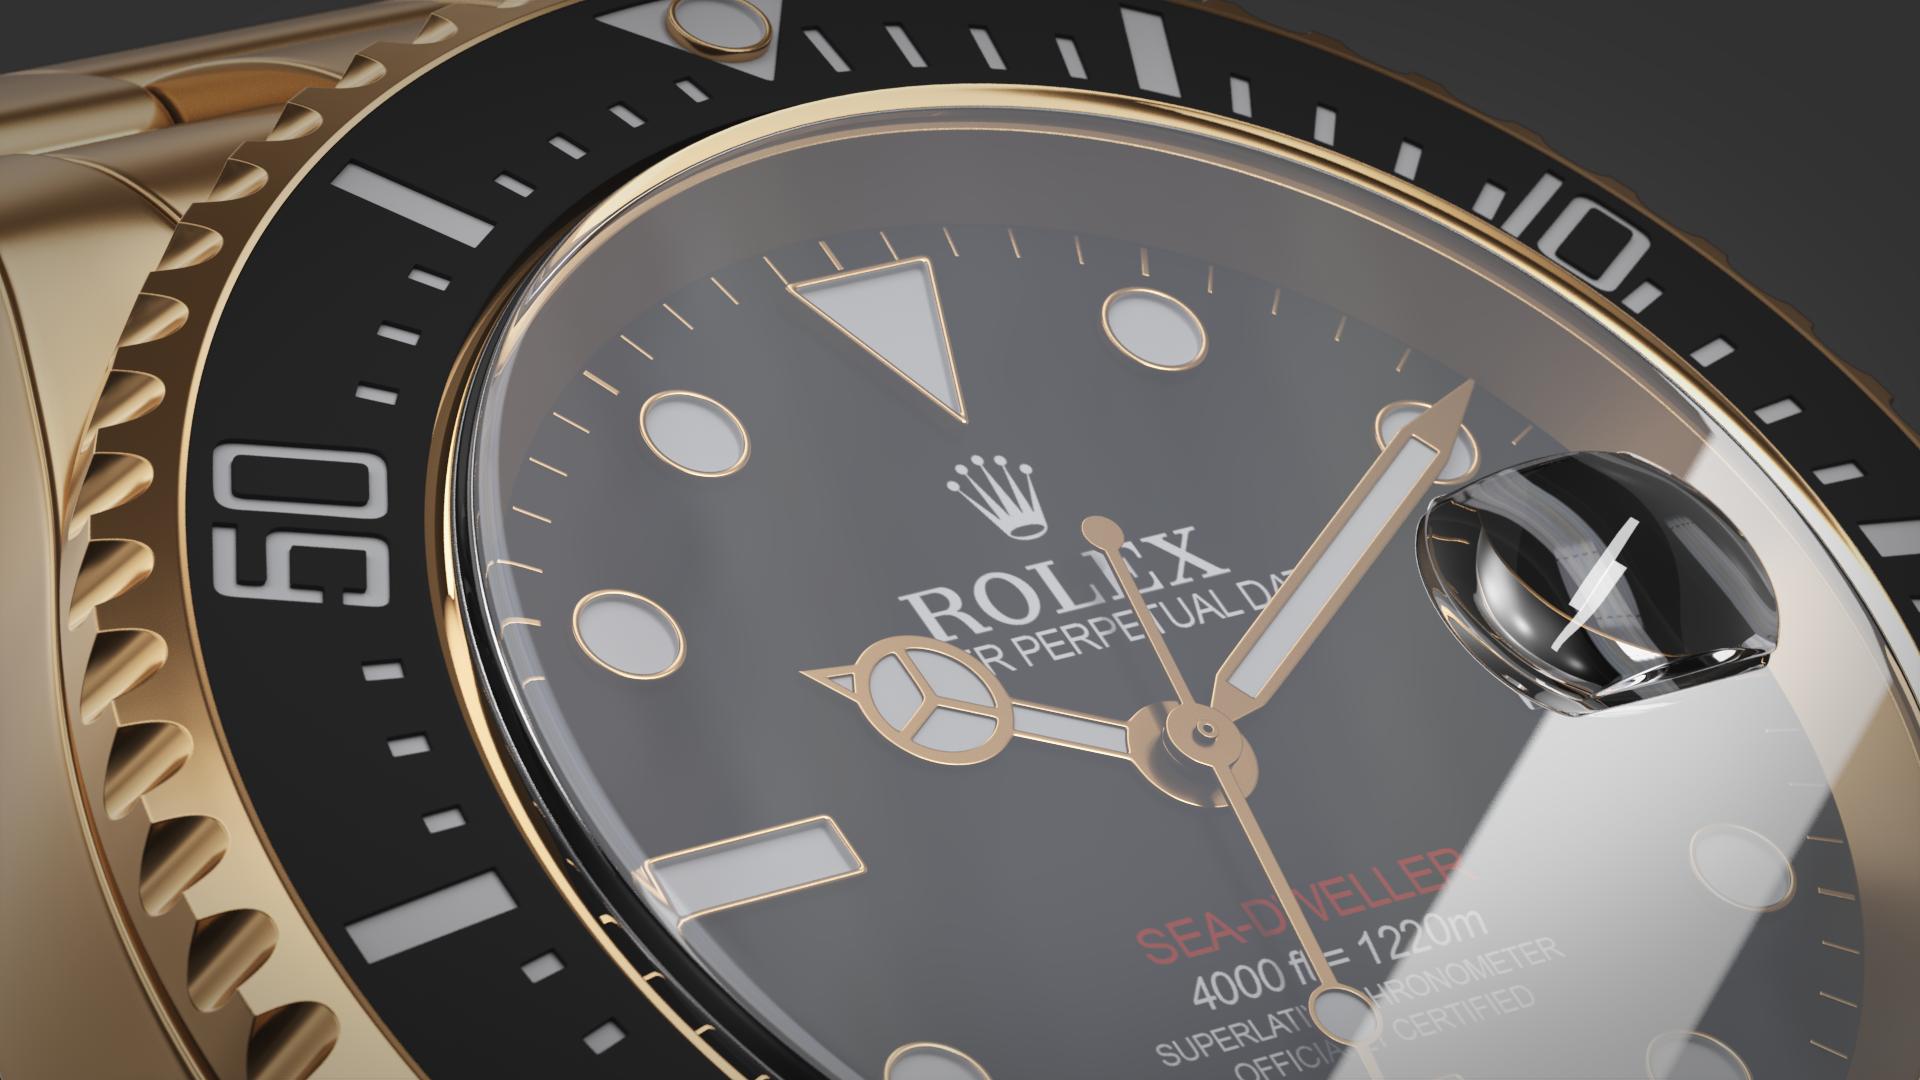 Rolex_Sea_Dweller_02-squashed.png